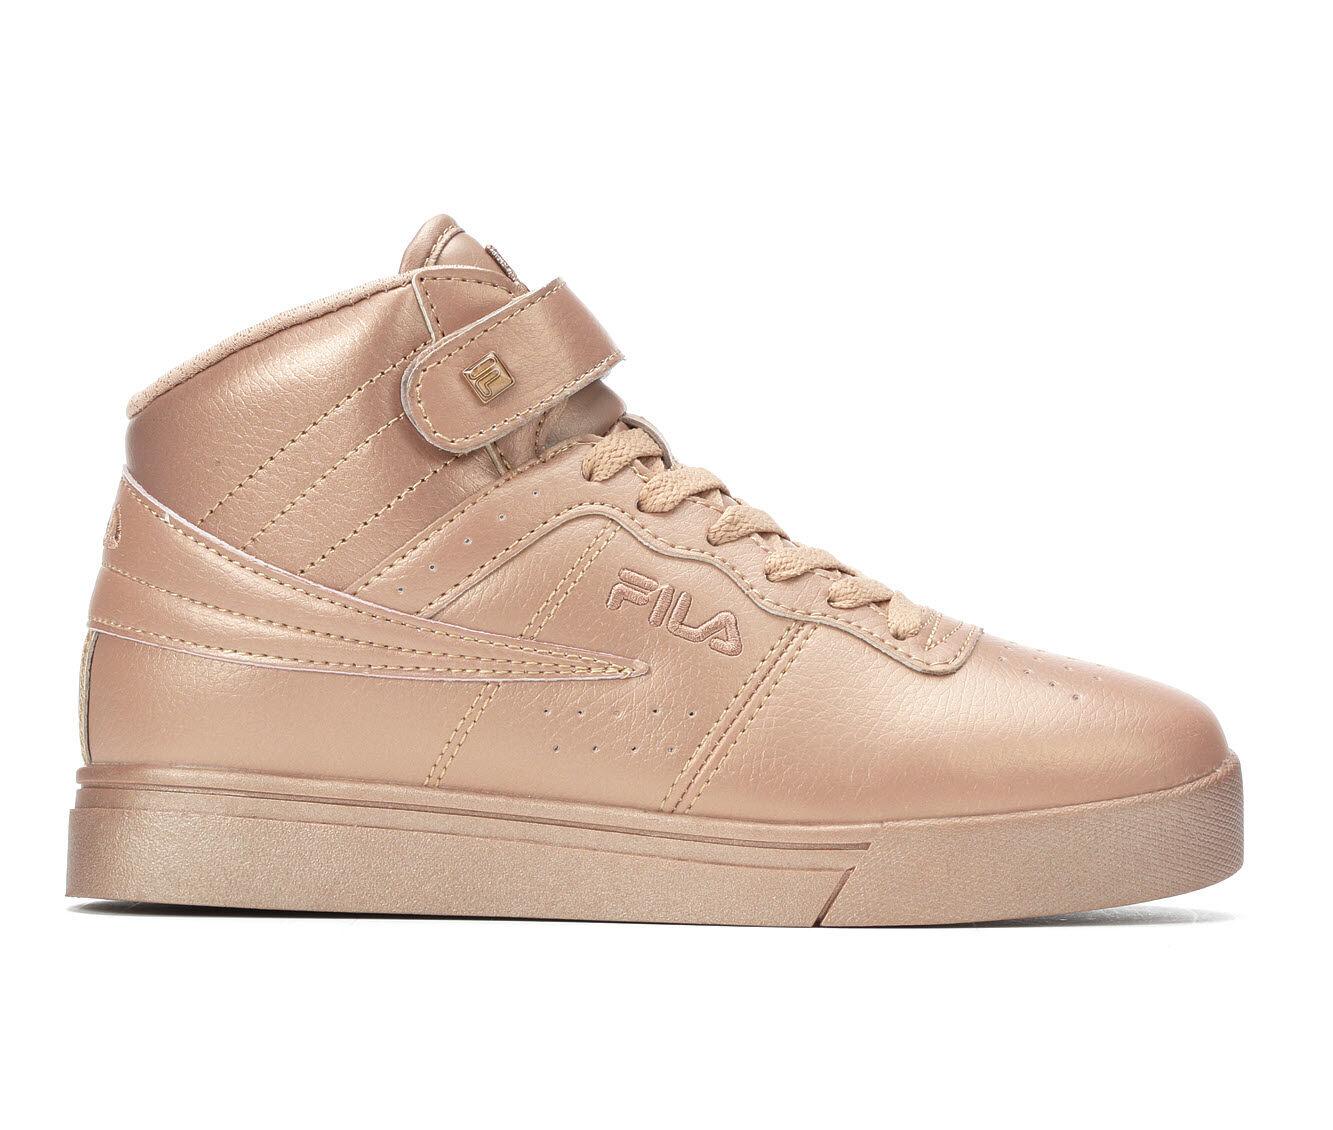 Women's Fila Vulc 13 MP Metallic Stars Basketball Shoes Pink